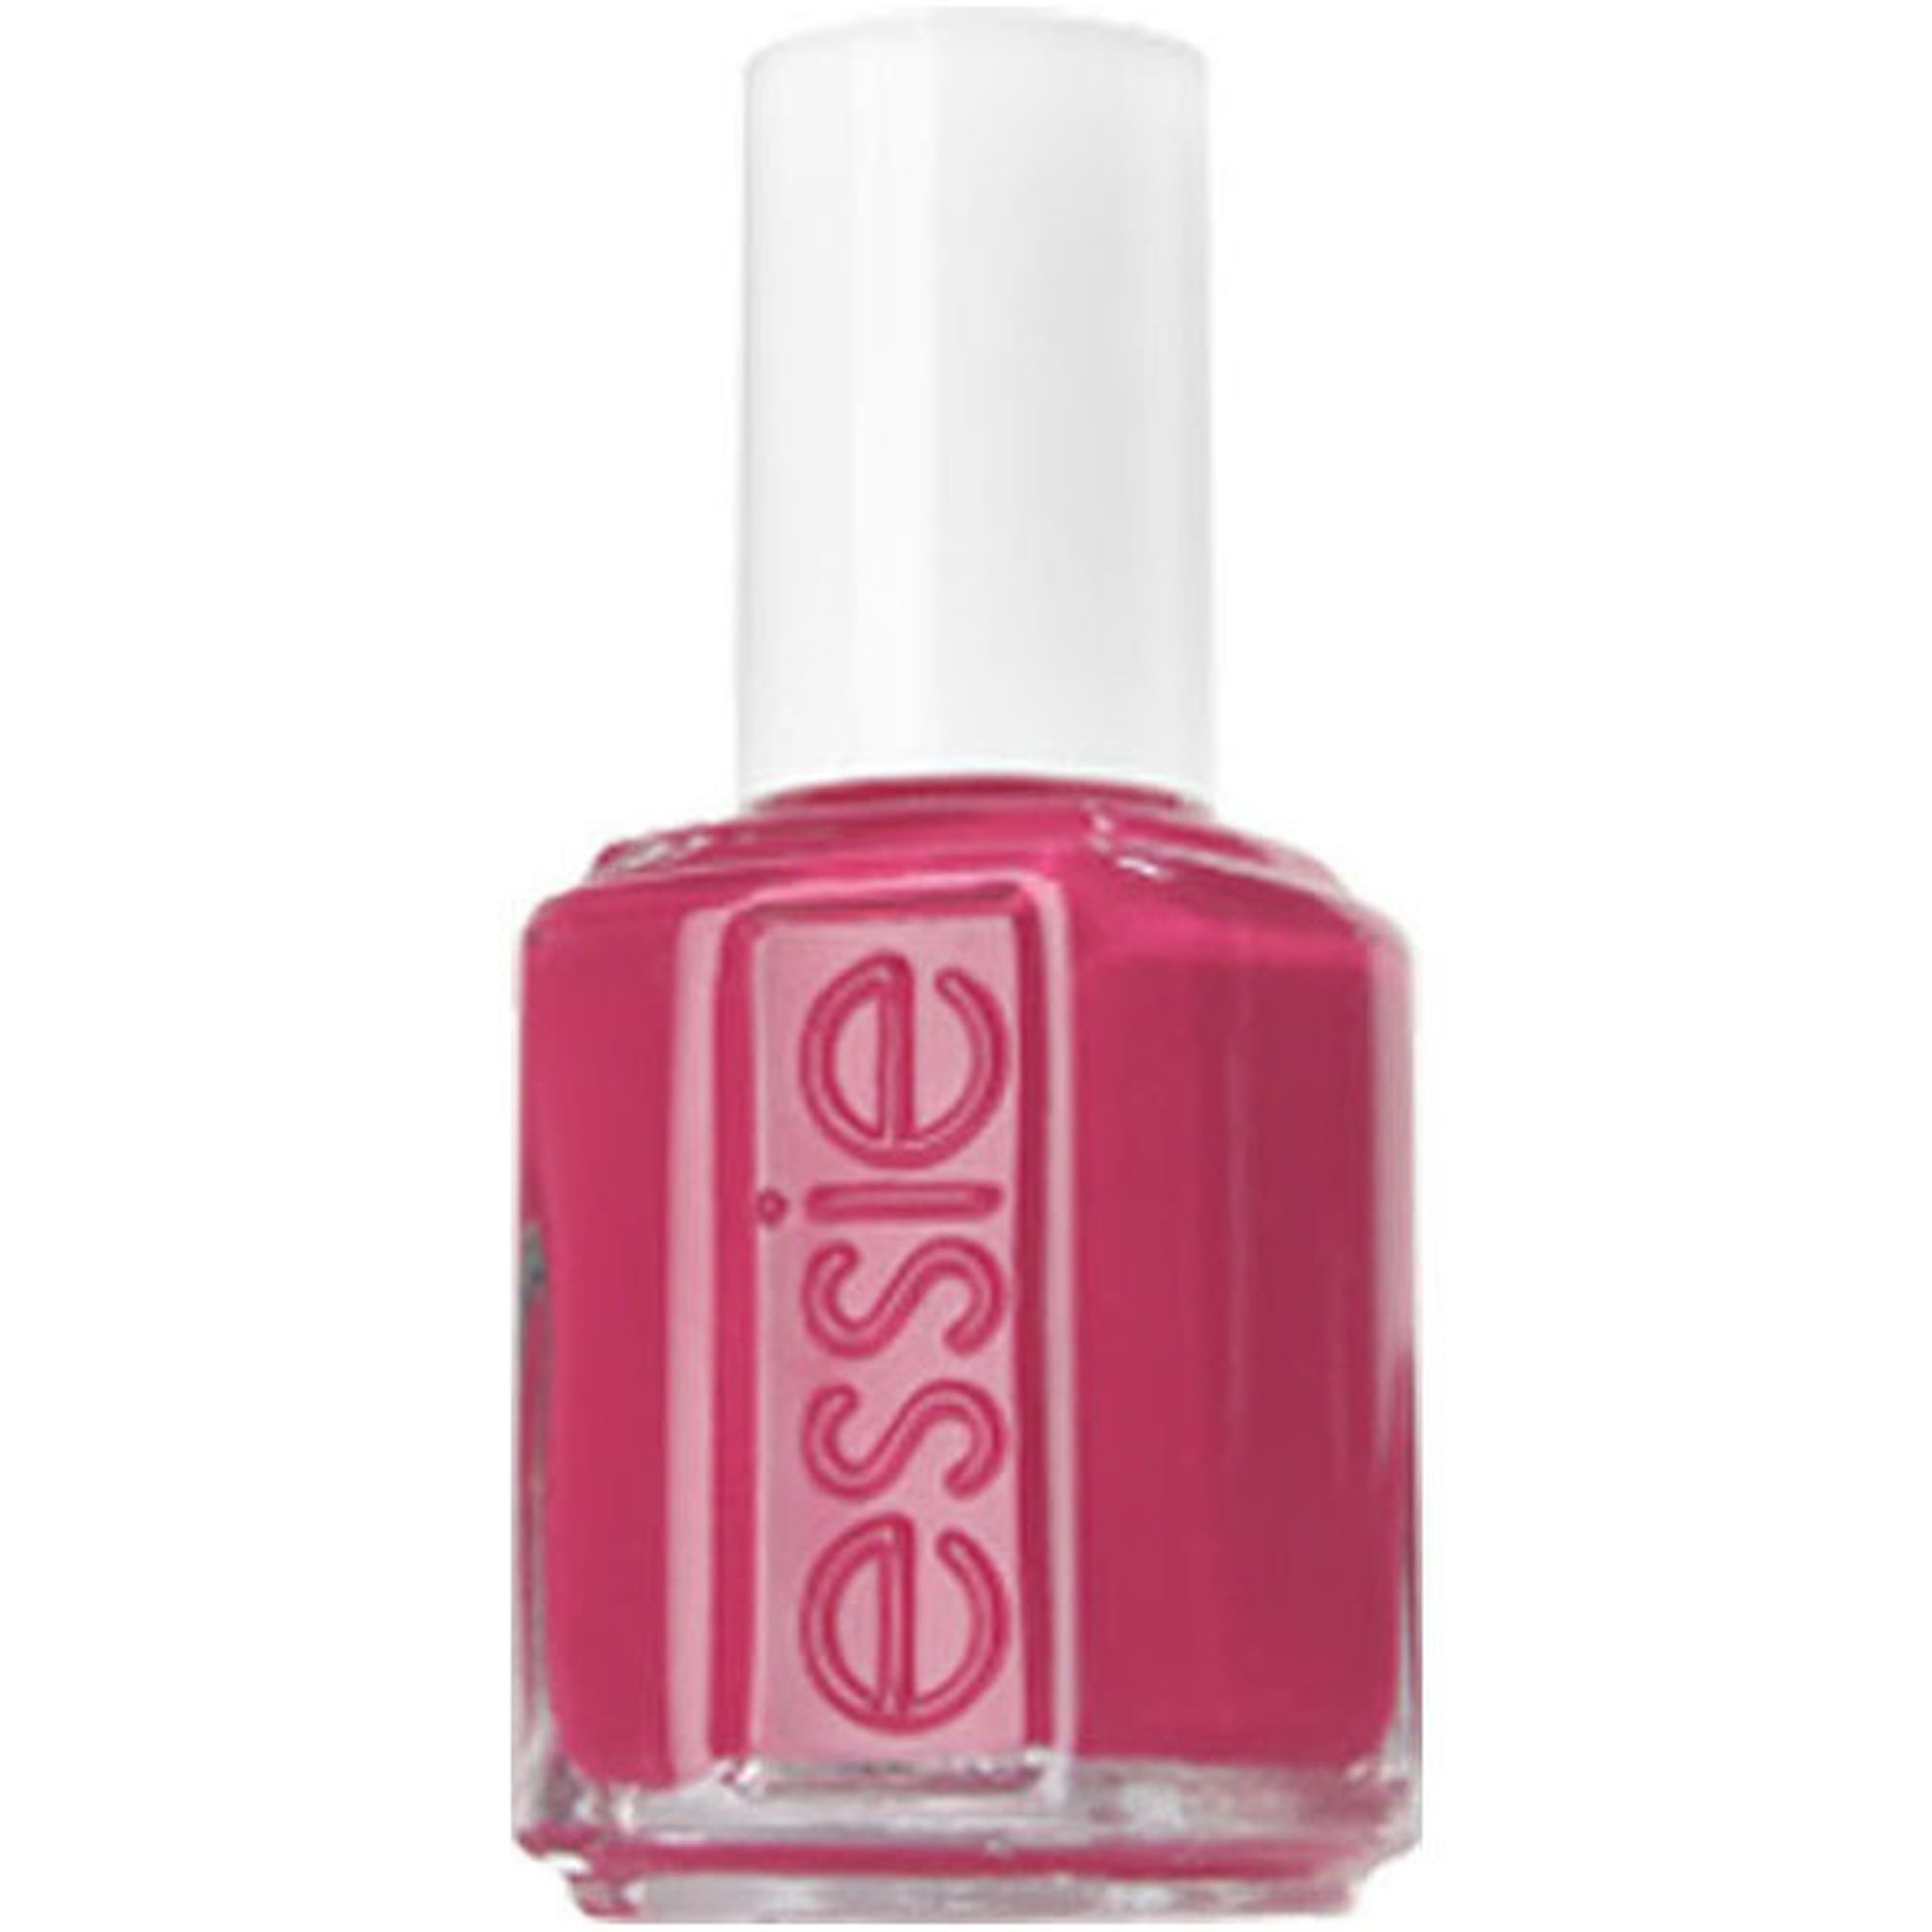 Essie Nail Polish - Watermelon 13.5ml | Professional Quality Nails